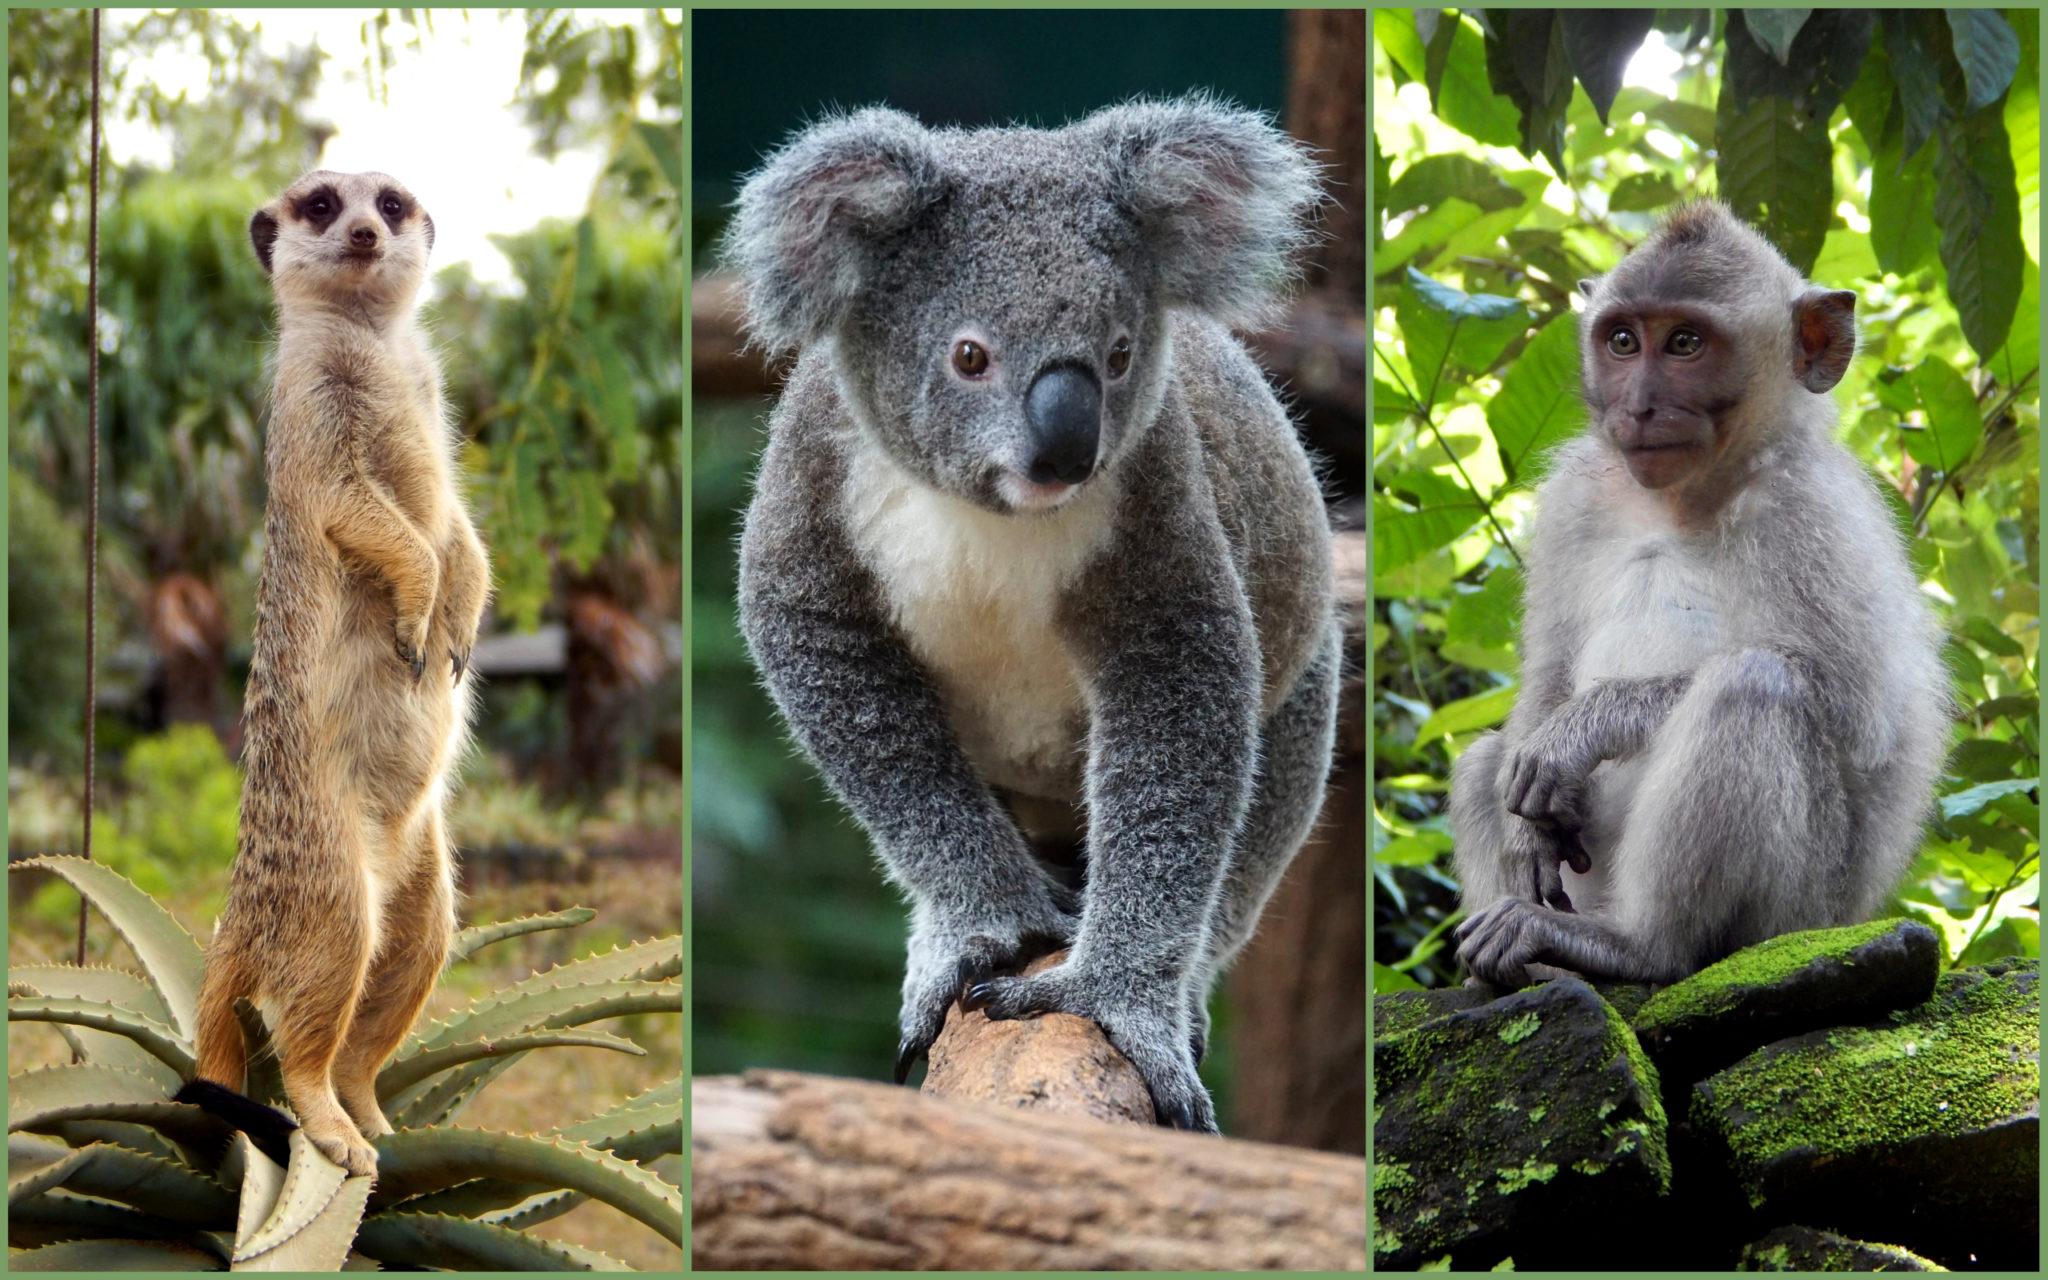 A photo of a meerkat, koala and monkey.